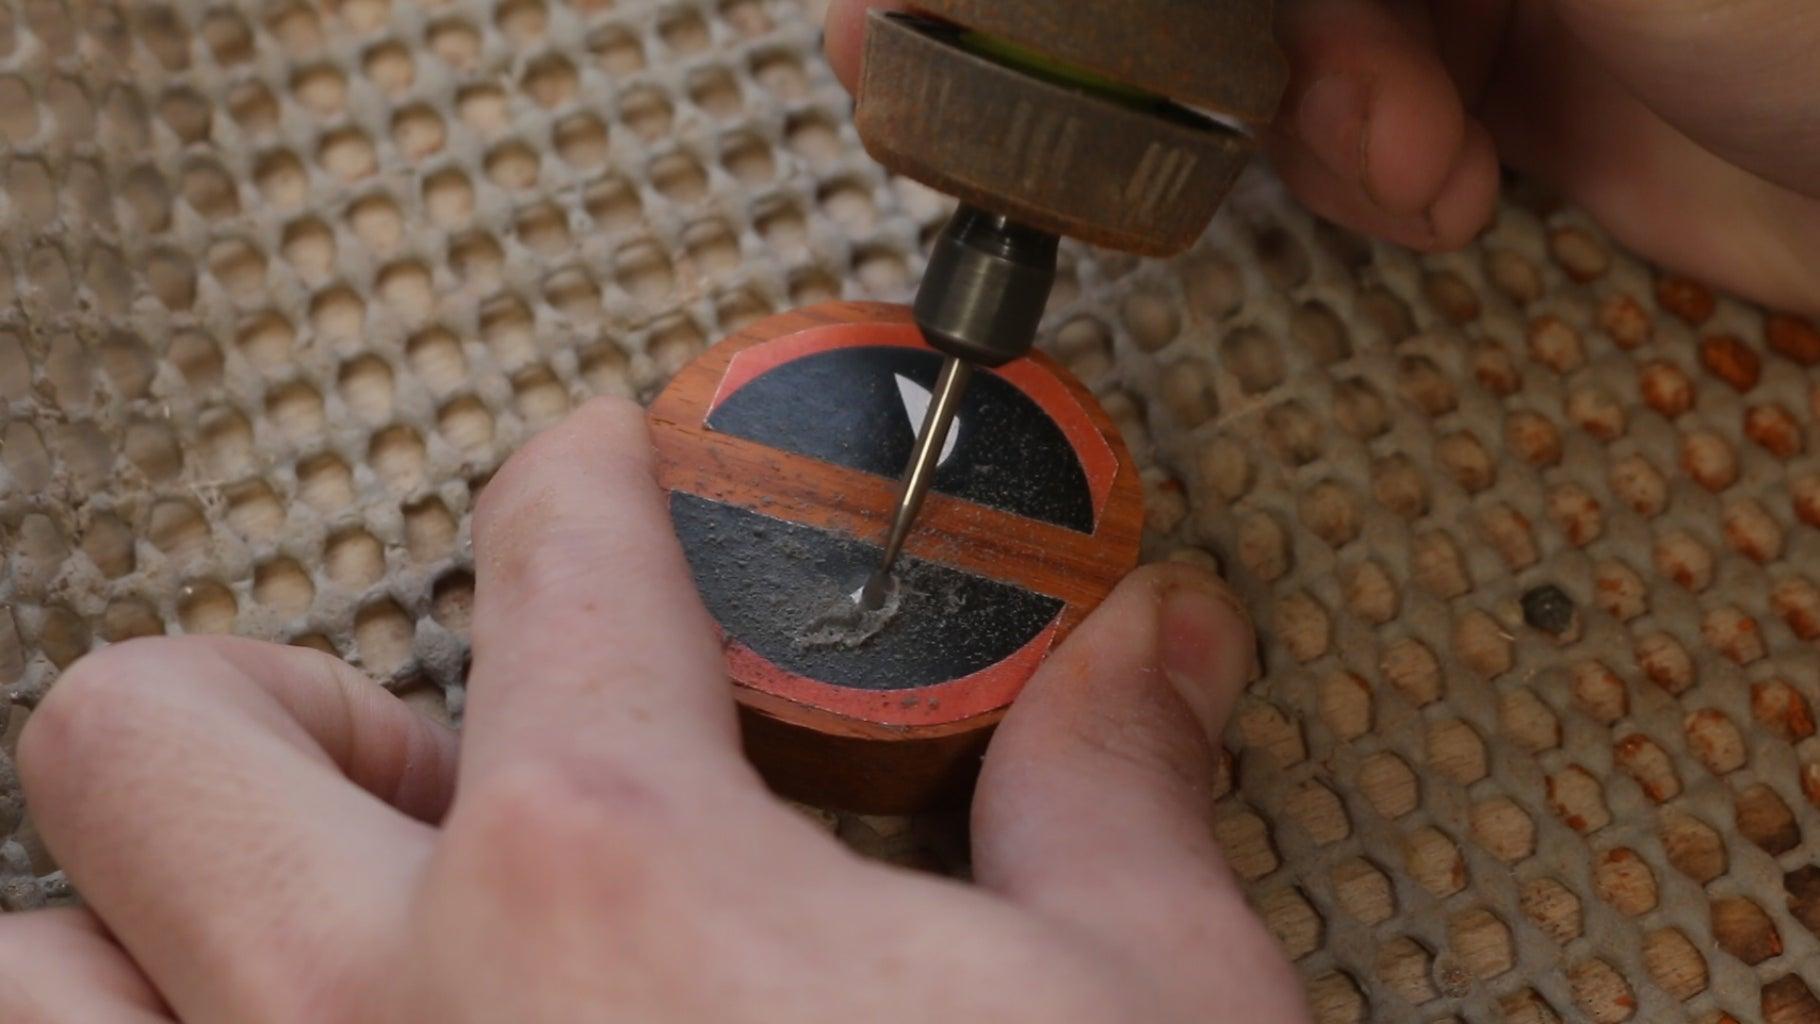 Adding the Milliput